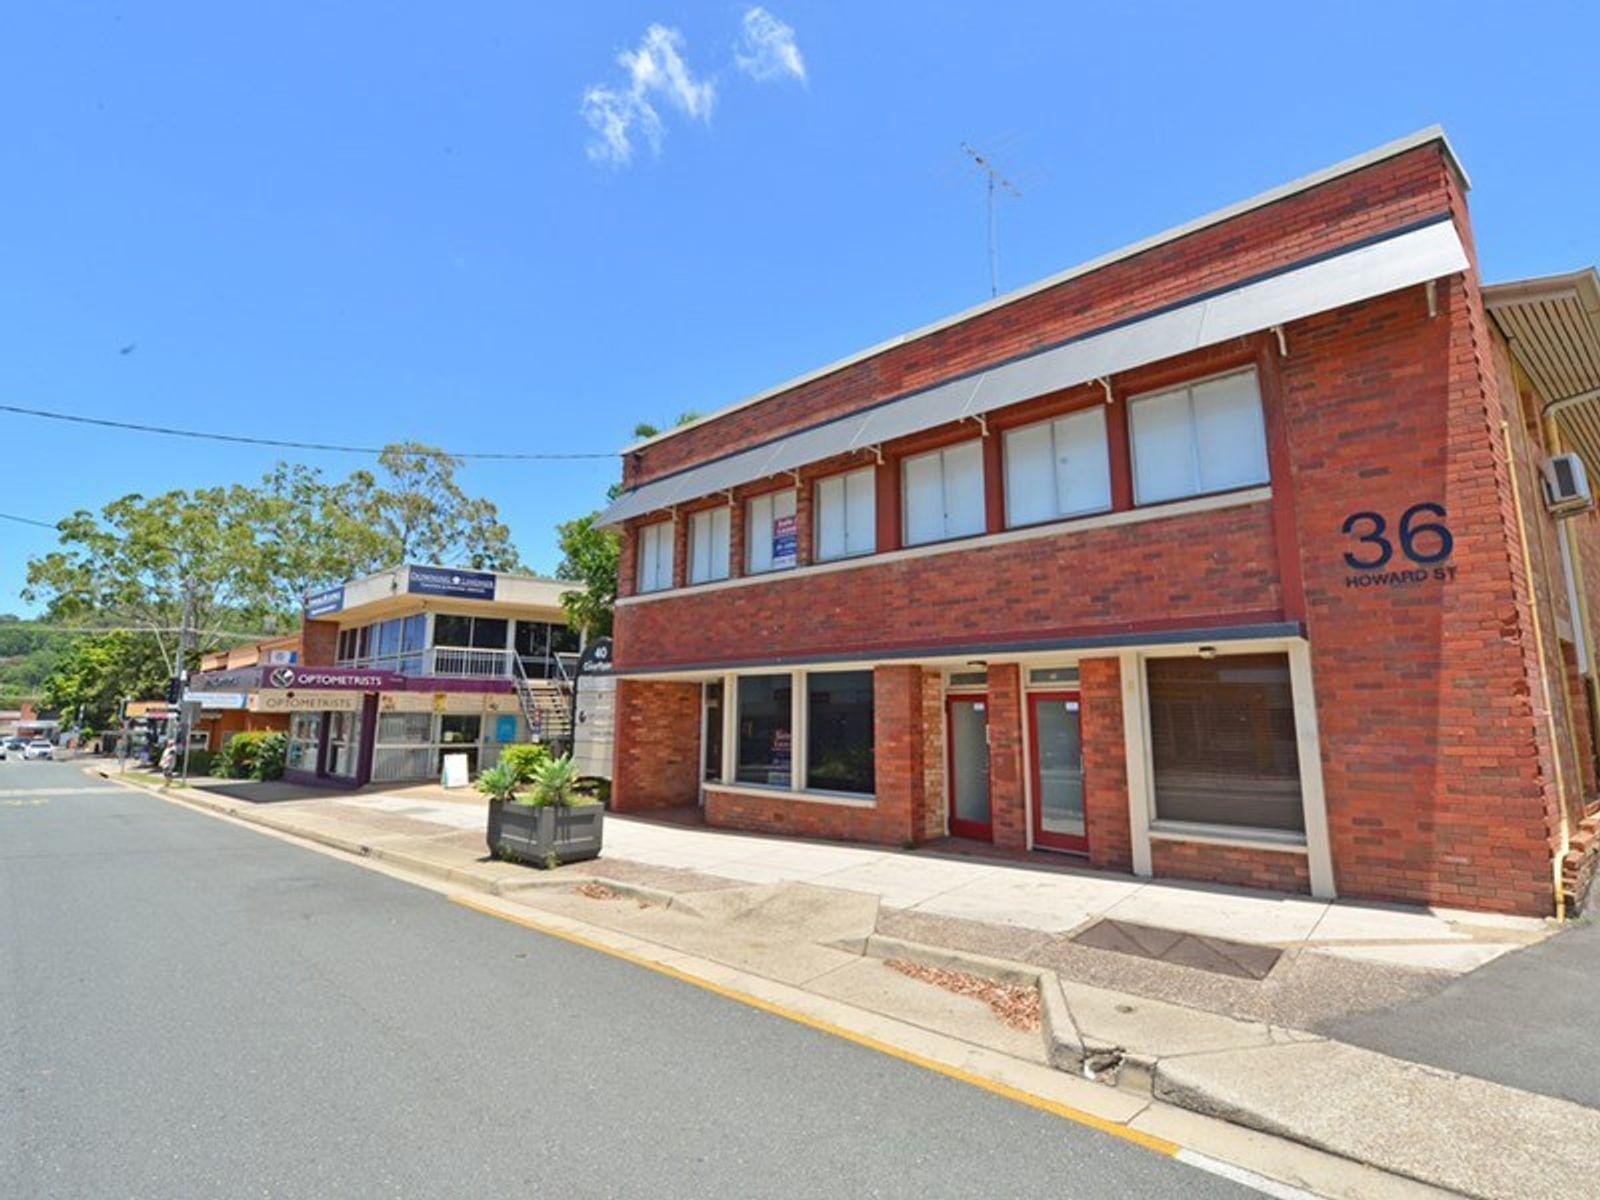 36 Howard St, Nambour, QLD 4560